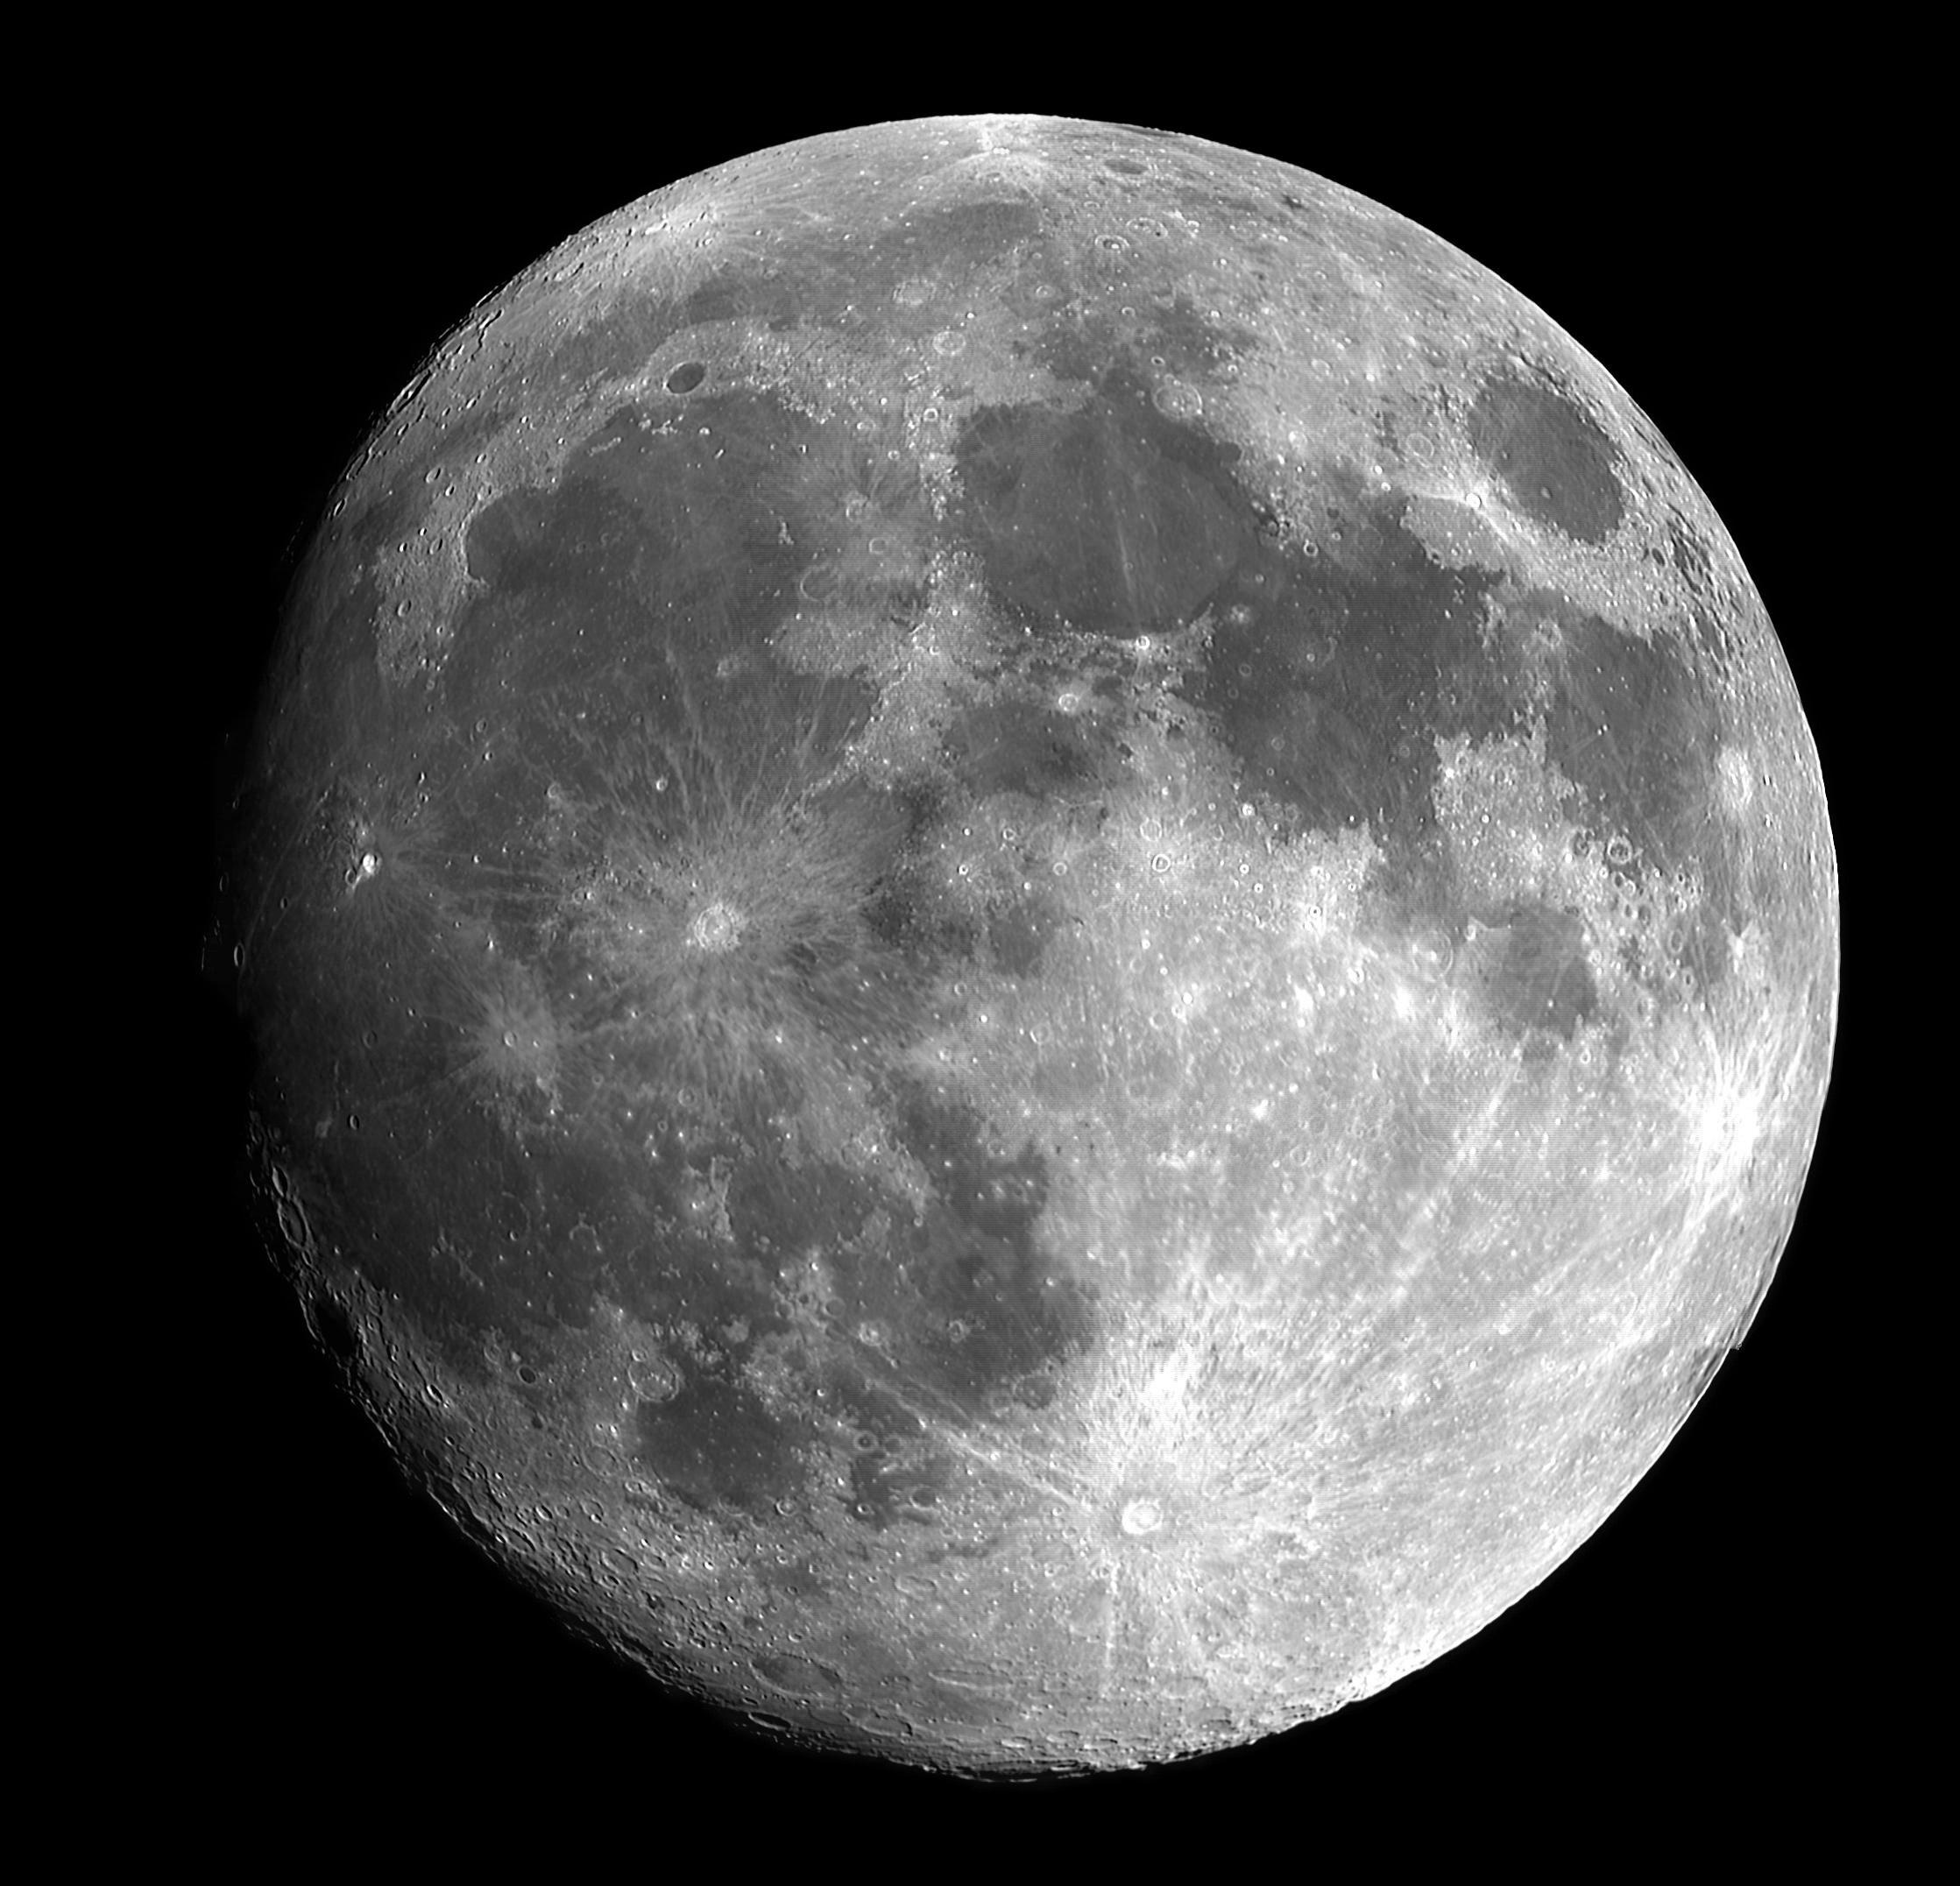 astronomy-black-and-white-bright-47367.jpg